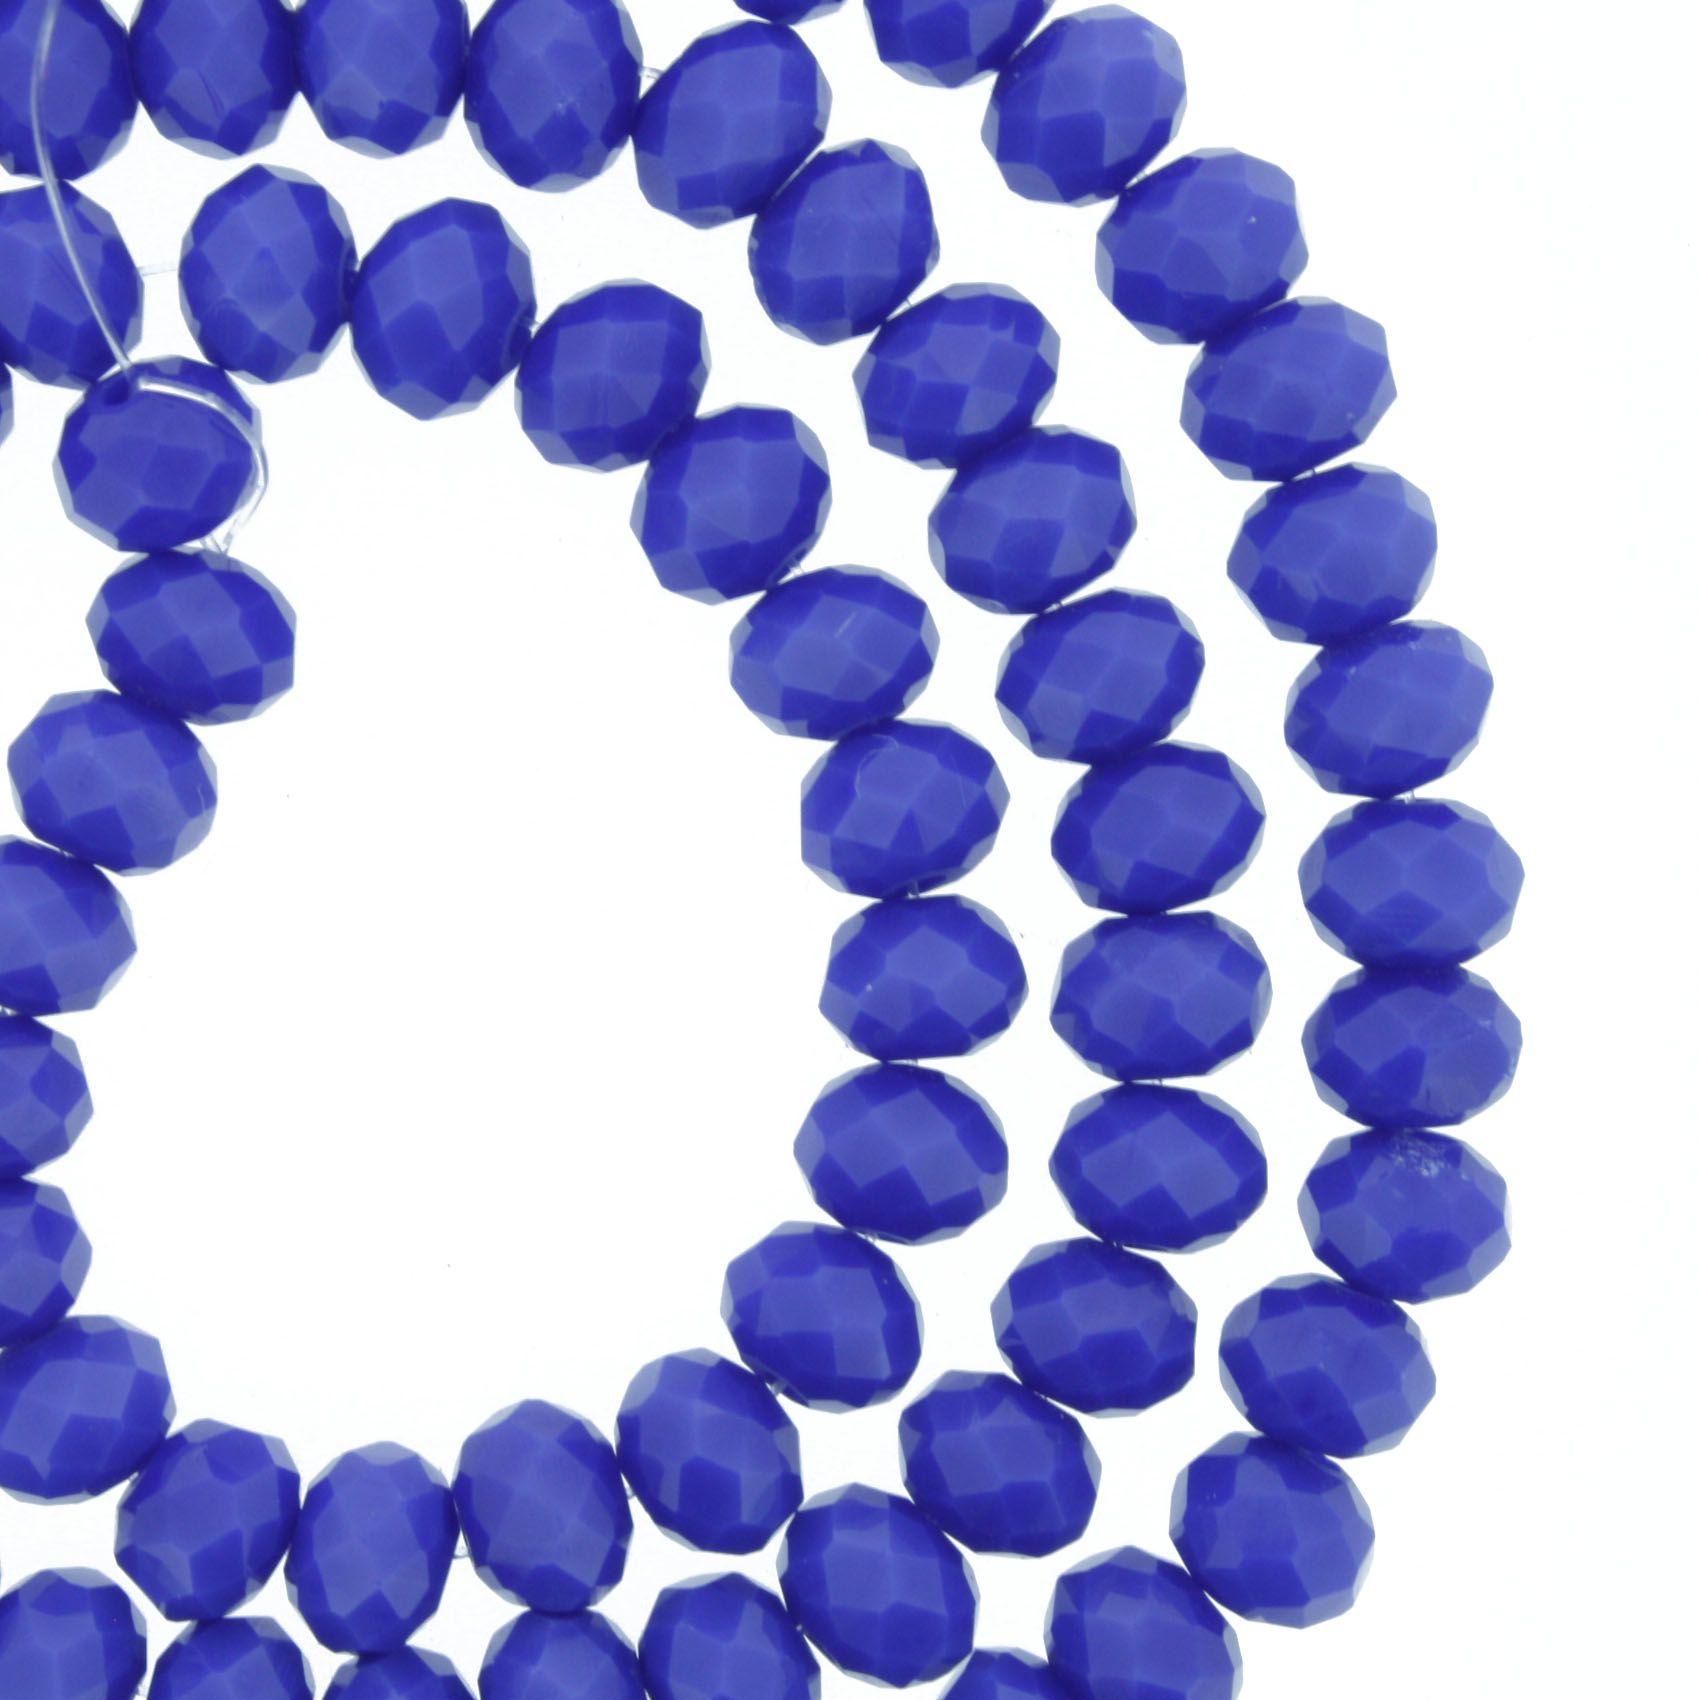 Fio de Cristal - Piatto® - Azul Royal - 6mm  - Universo Religioso® - Artigos de Umbanda e Candomblé